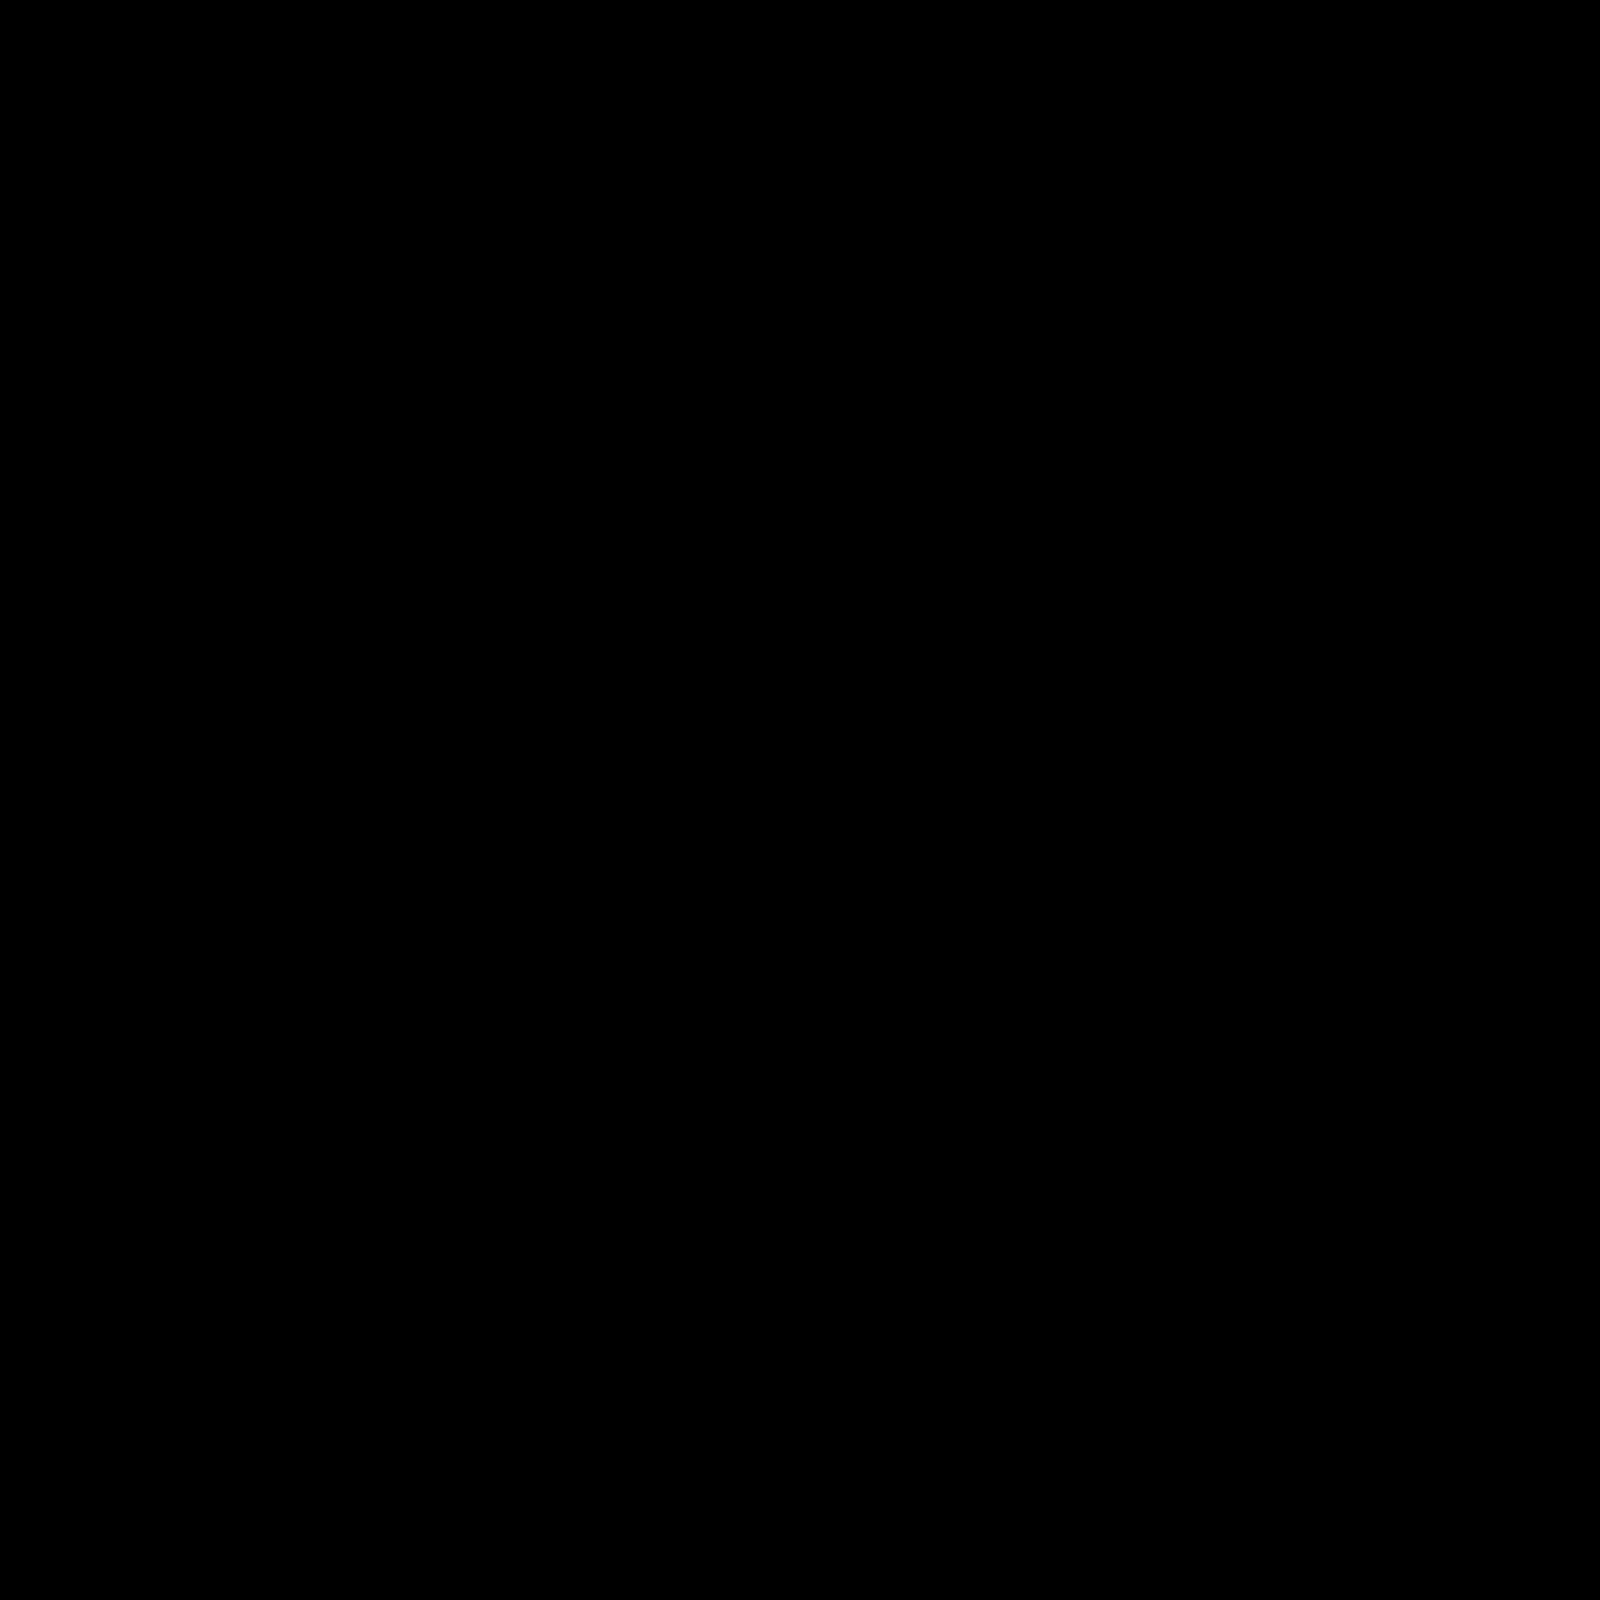 Ciclismo BMX icon